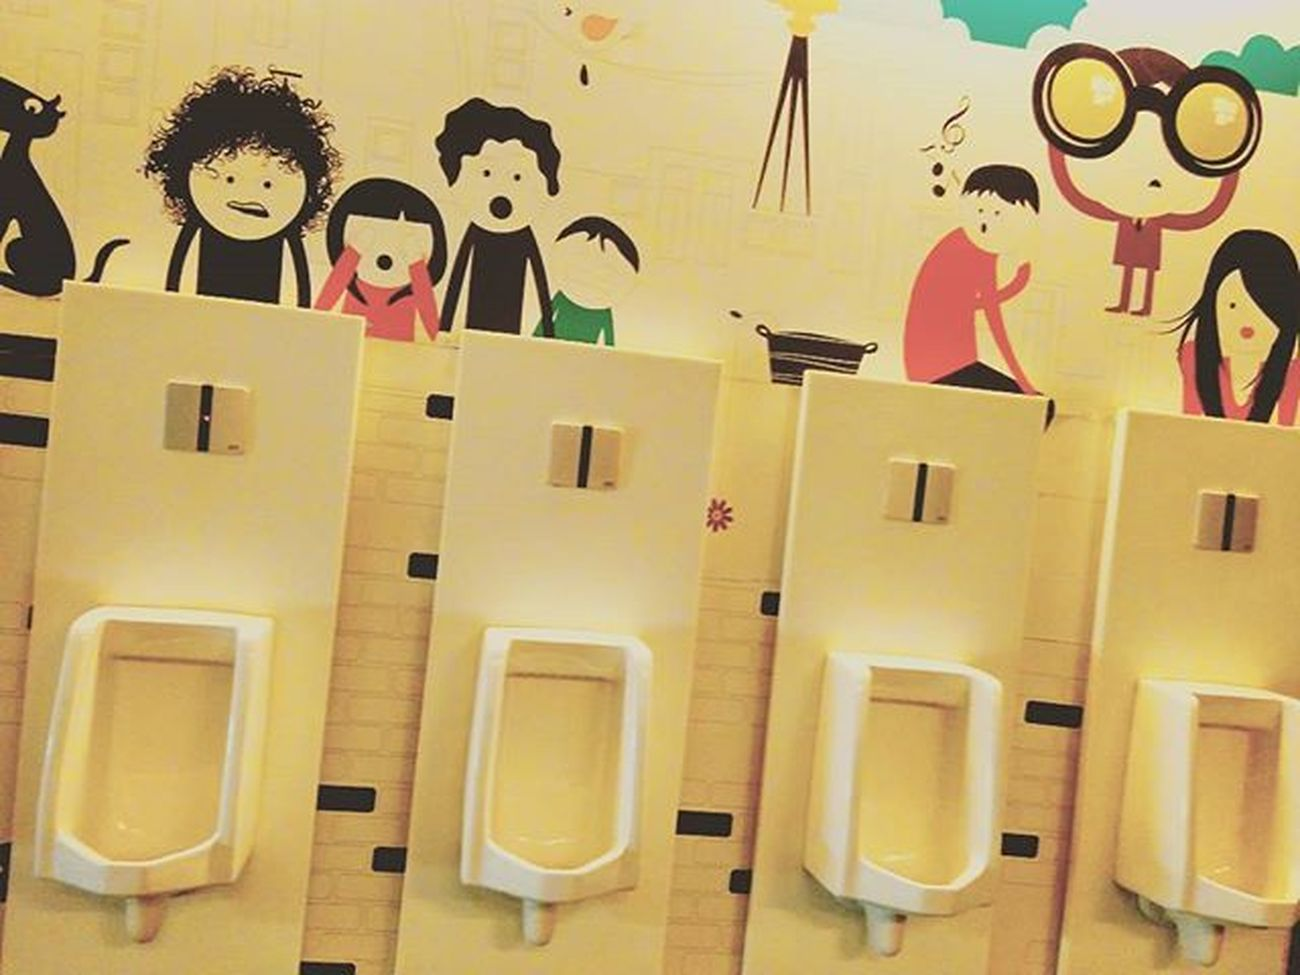 Gotta Love the graffiti on the wall. Epicuria Nehruplace Toilet Washroom Loo Urinal DelhiGram Sodelhi